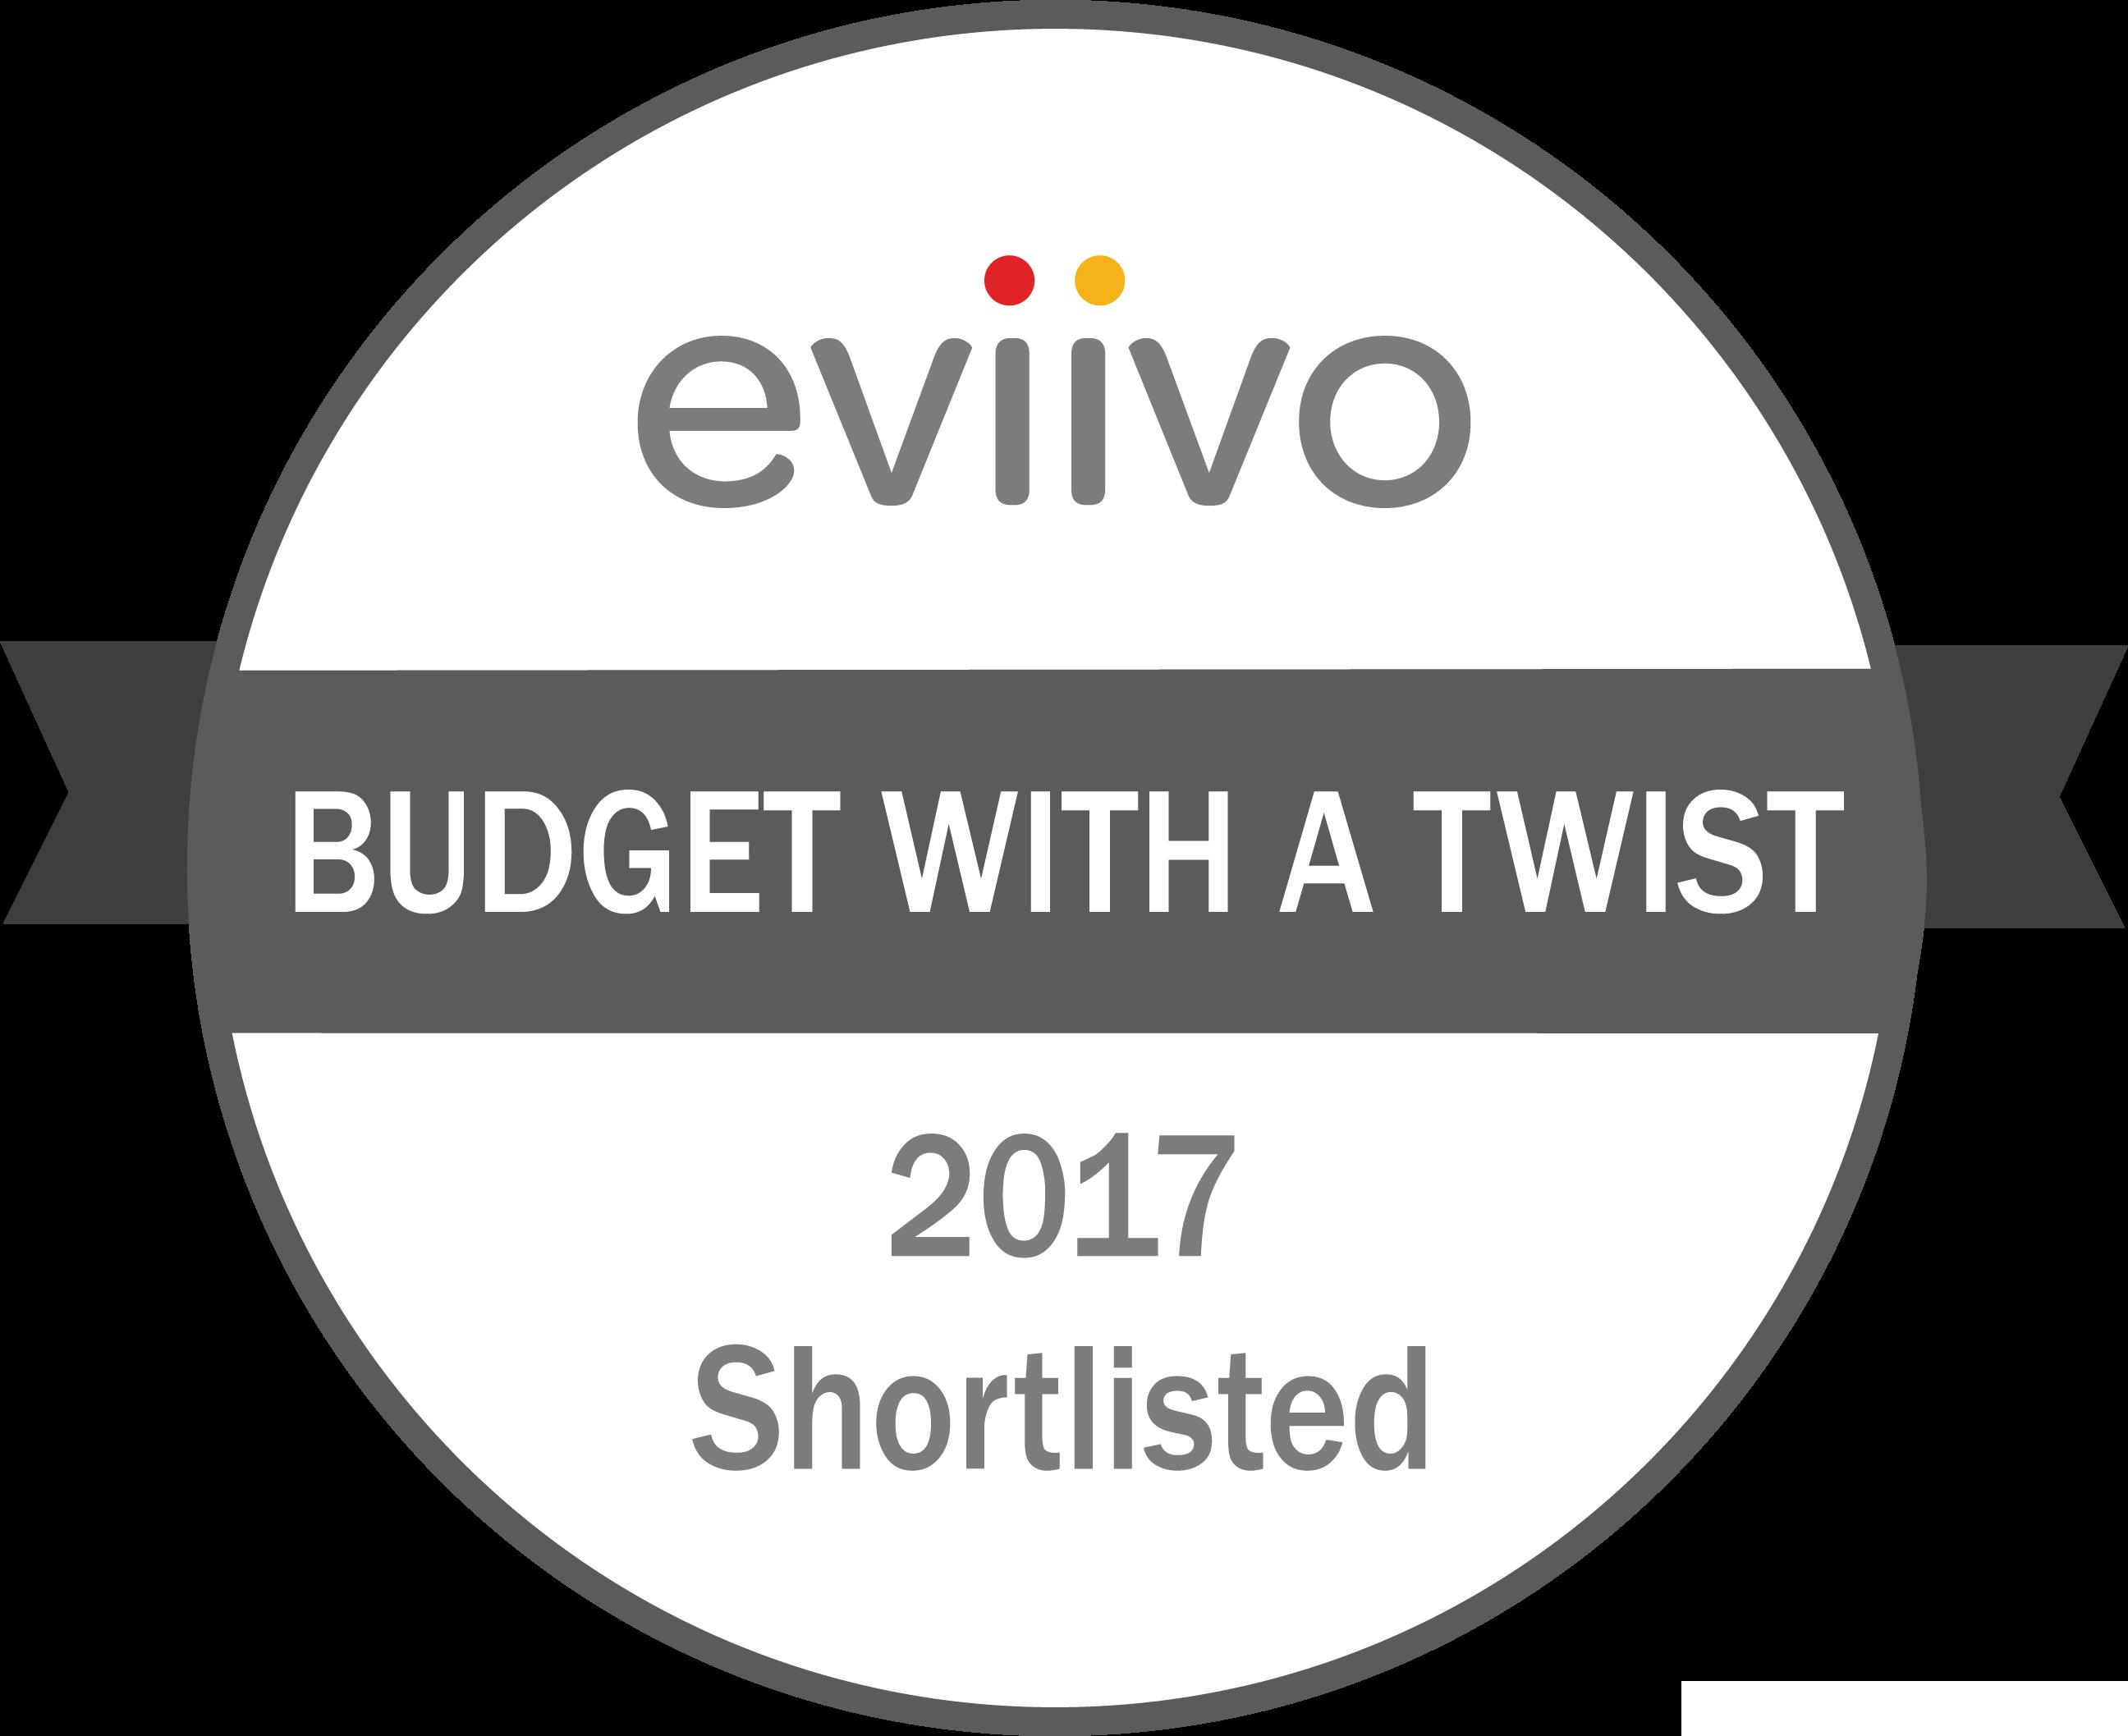 eviivo awards 2017 shortlist